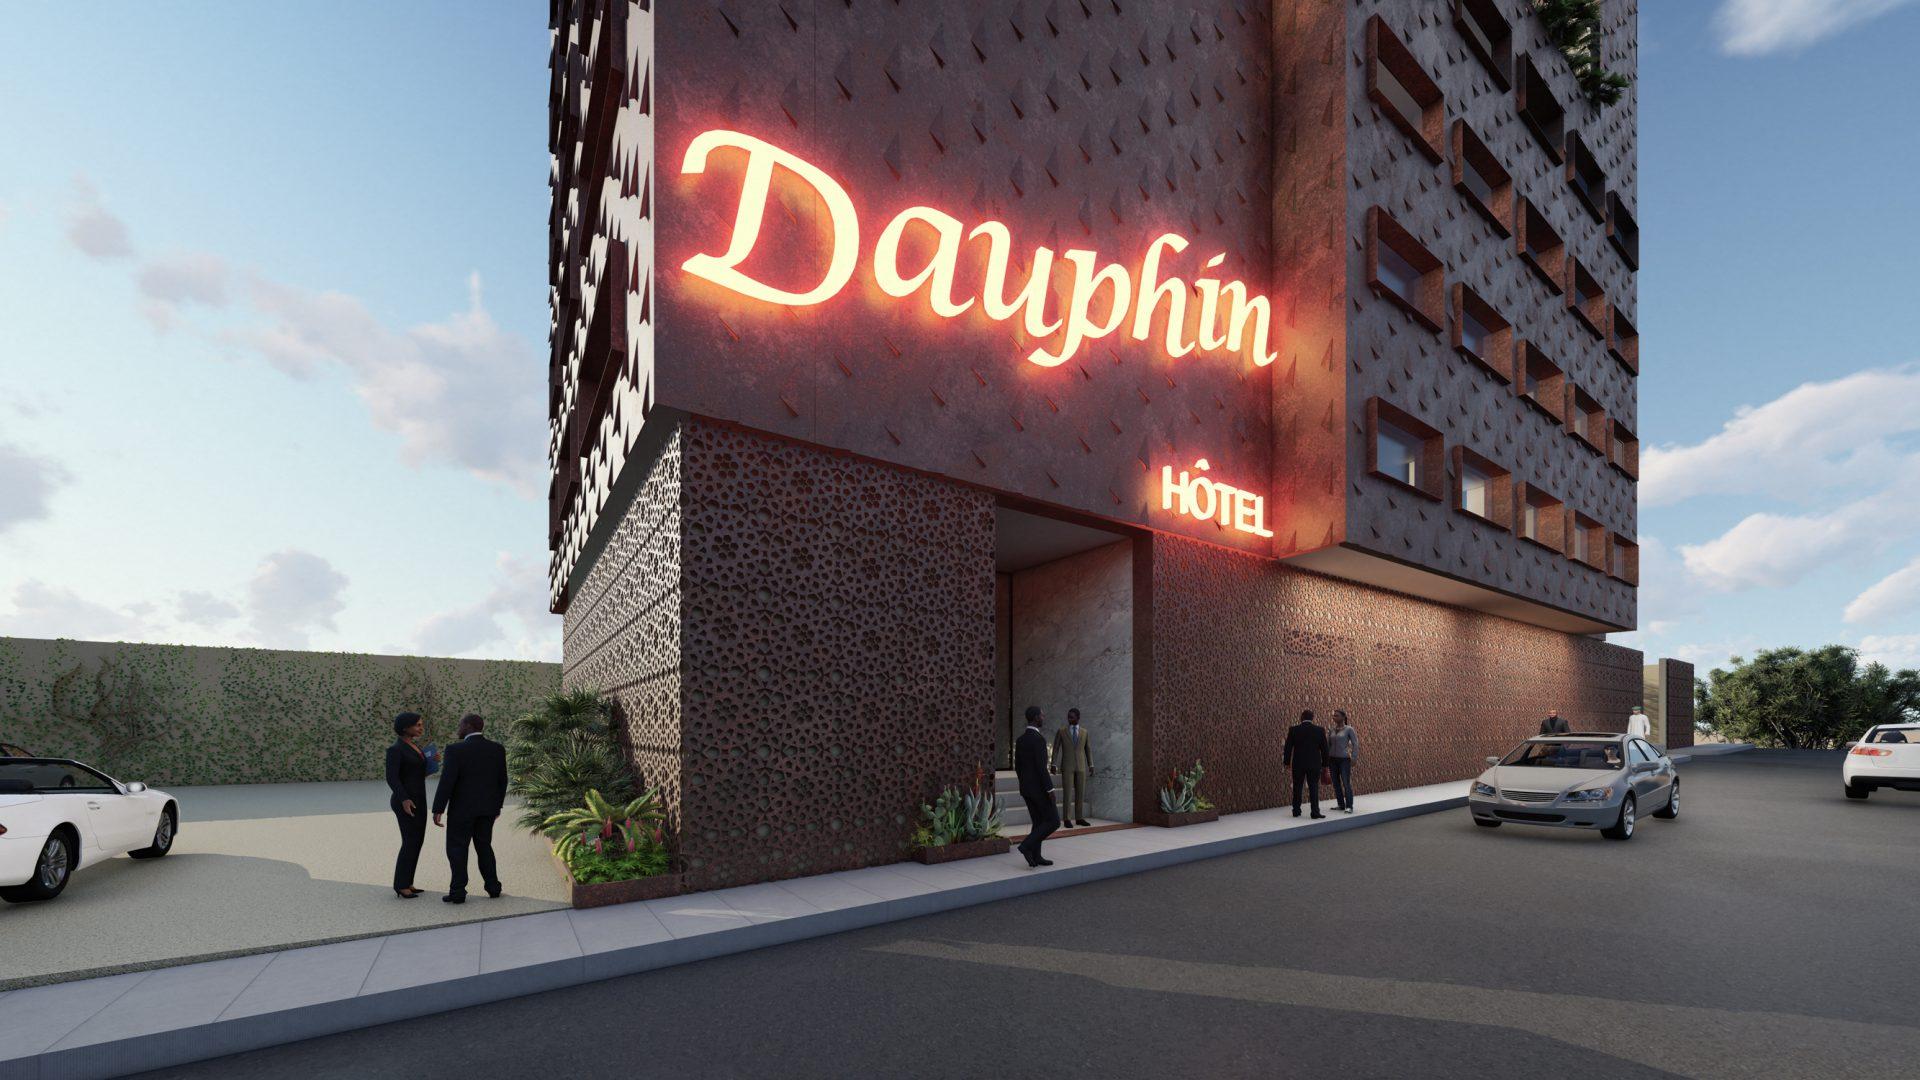 DAUPHIN HOTEL